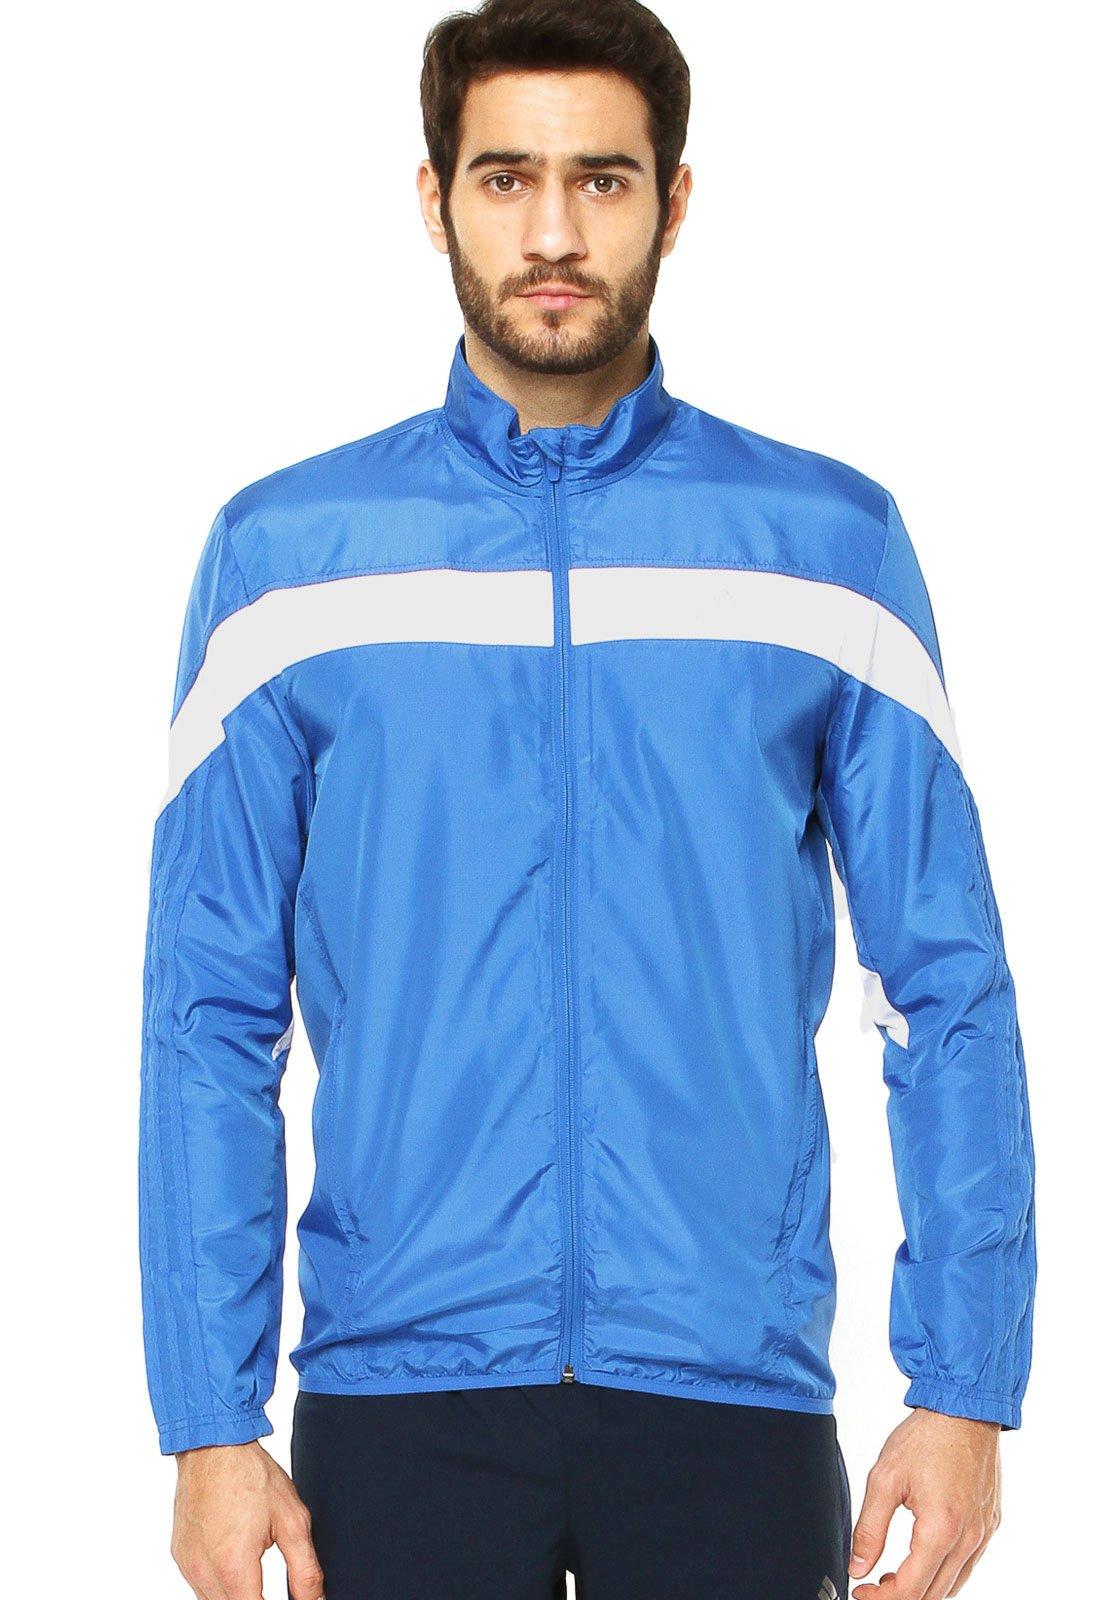 jaqueta adidas azul claro